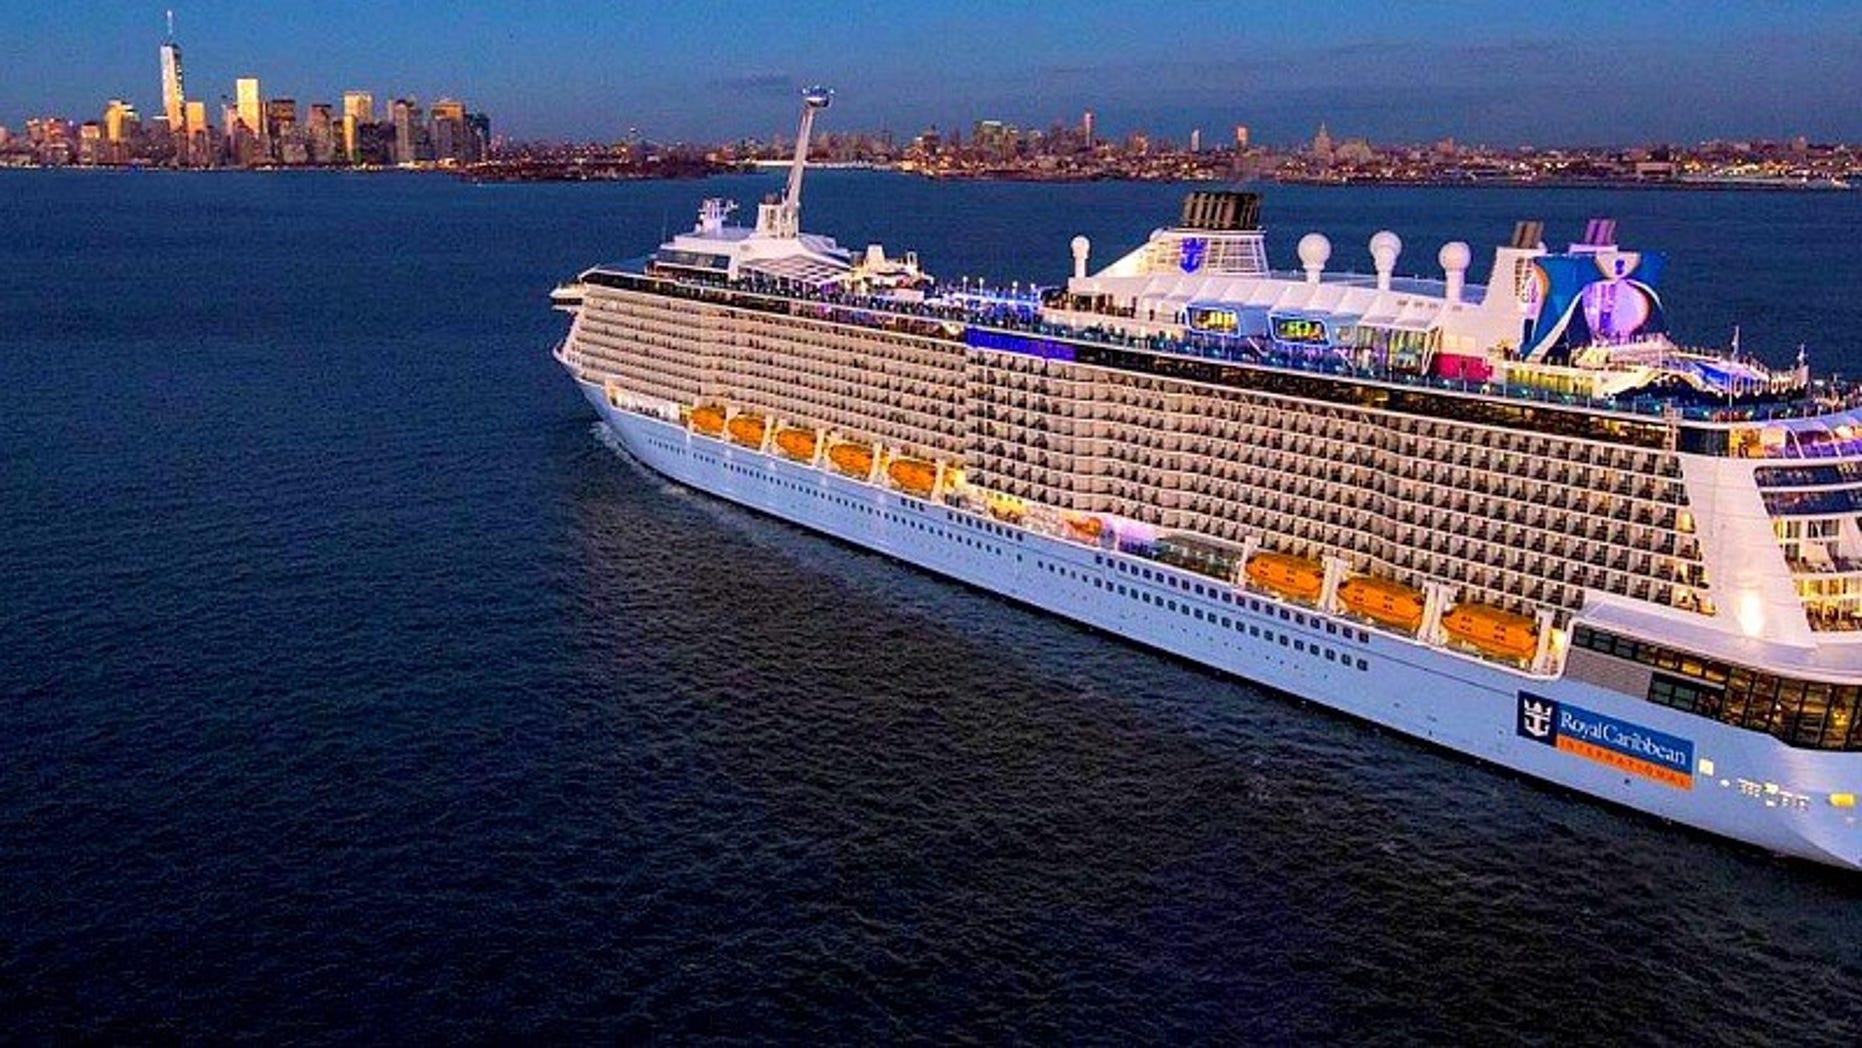 The Quantum of the Seas sets sail around New York City.